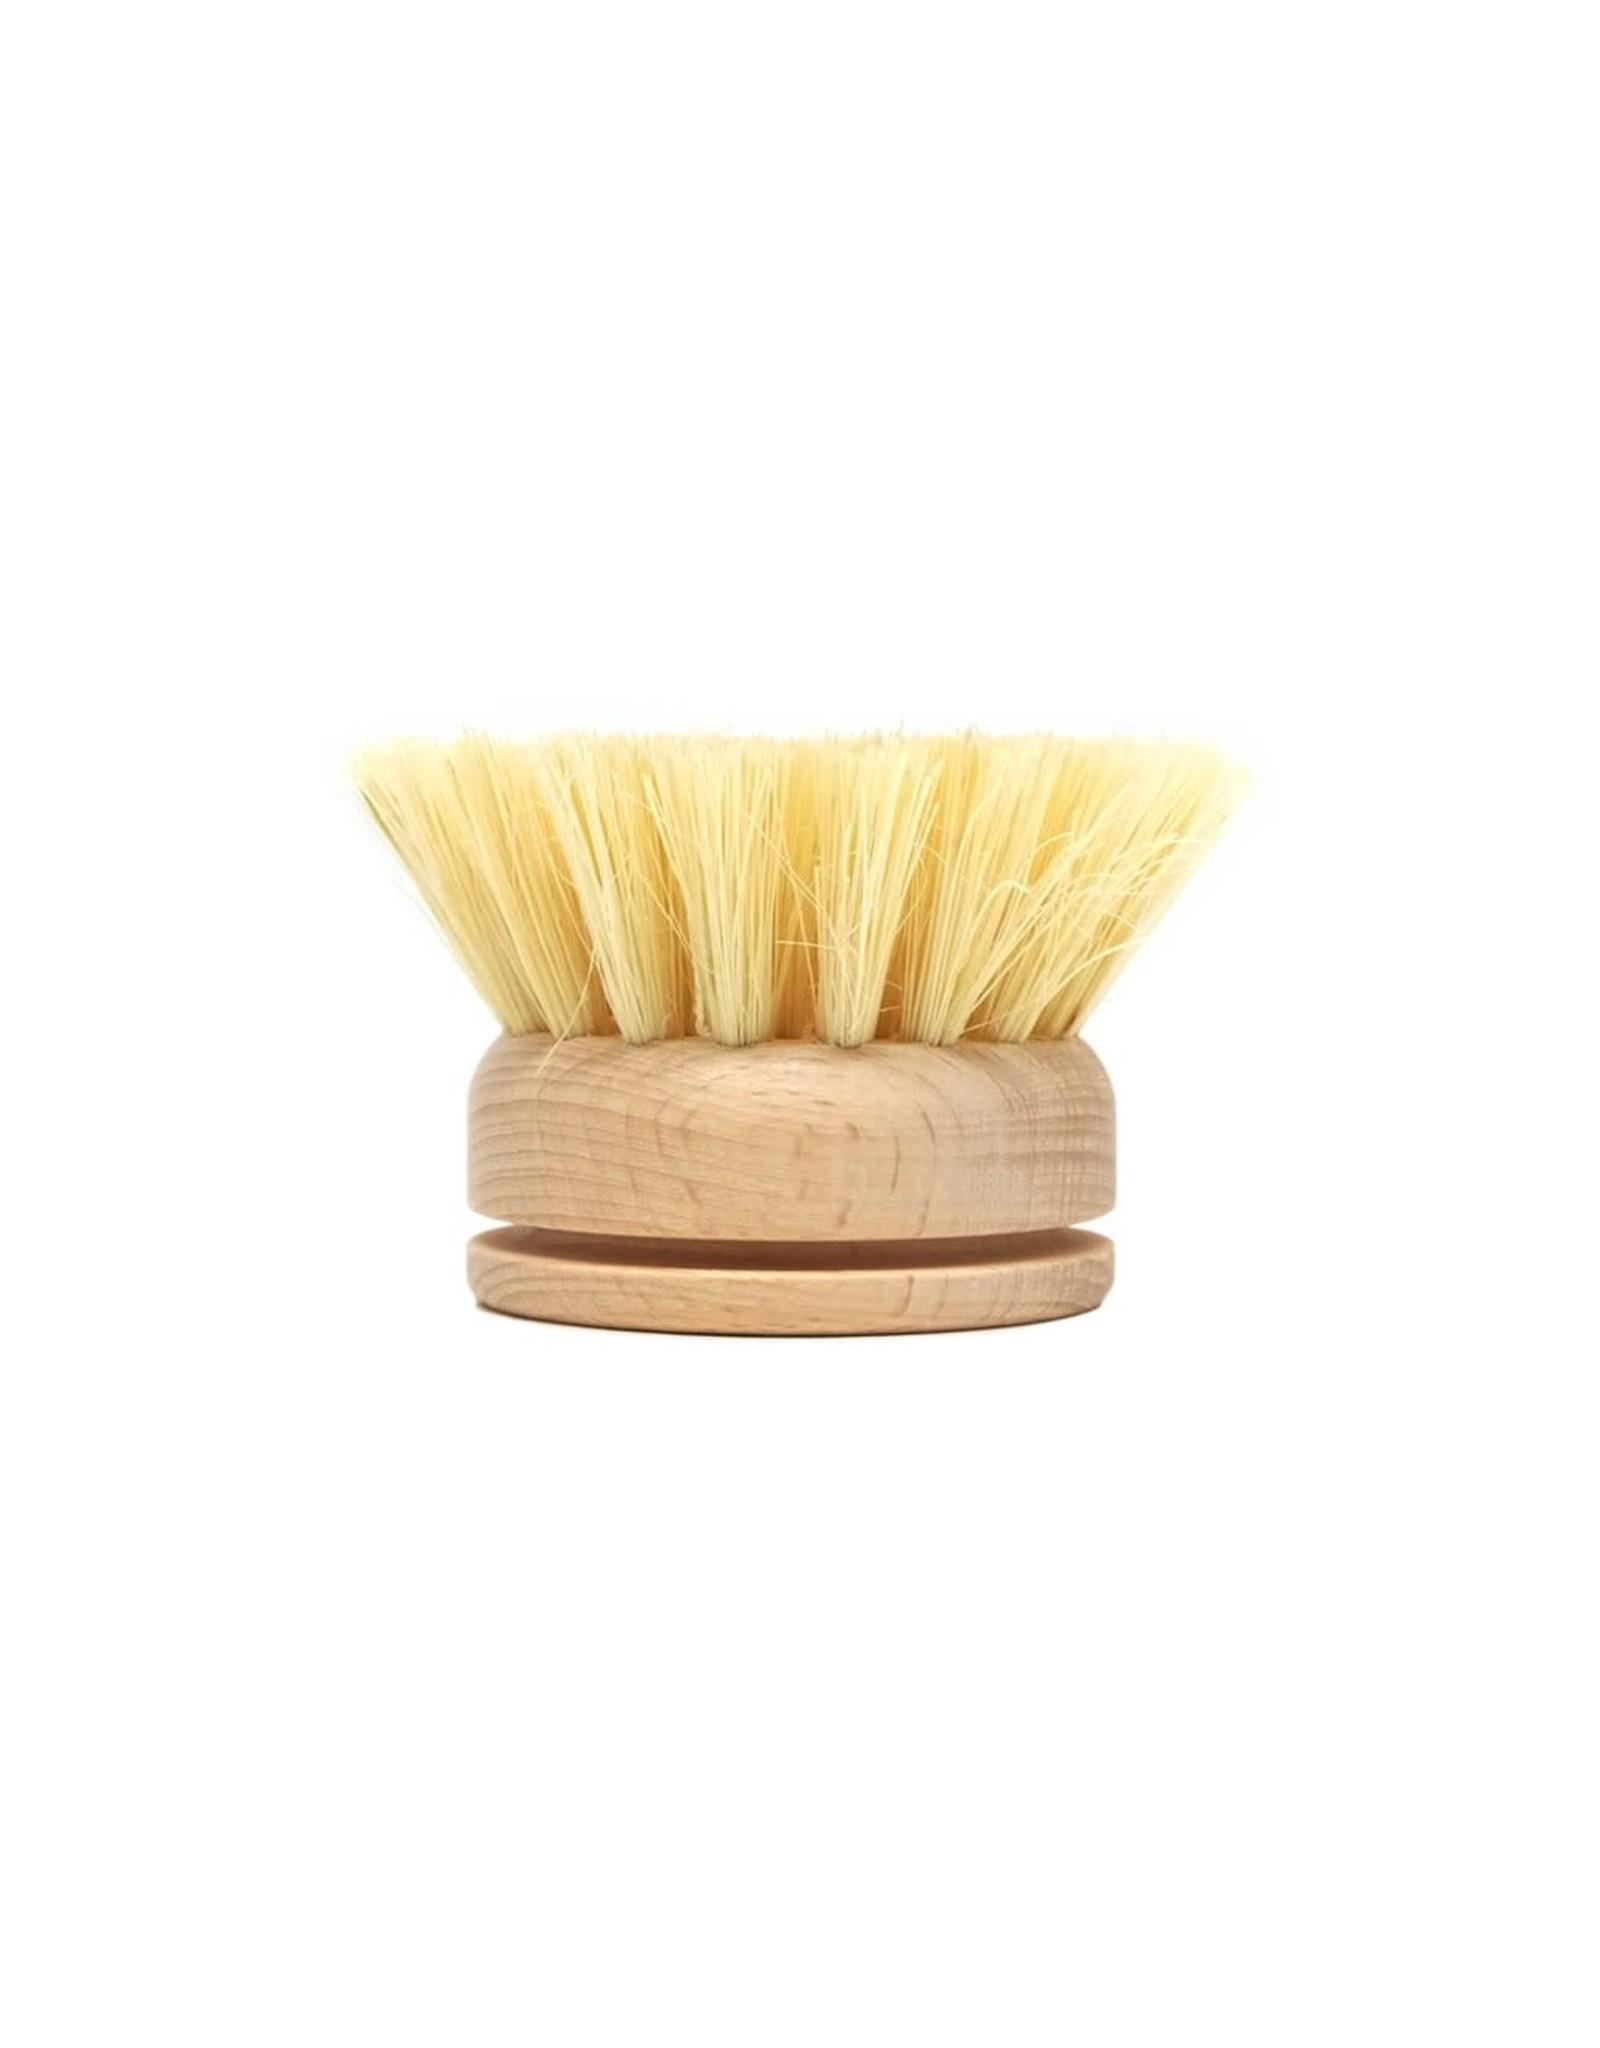 Maison Soleil Beech Wood Dish Brush Replacement Head